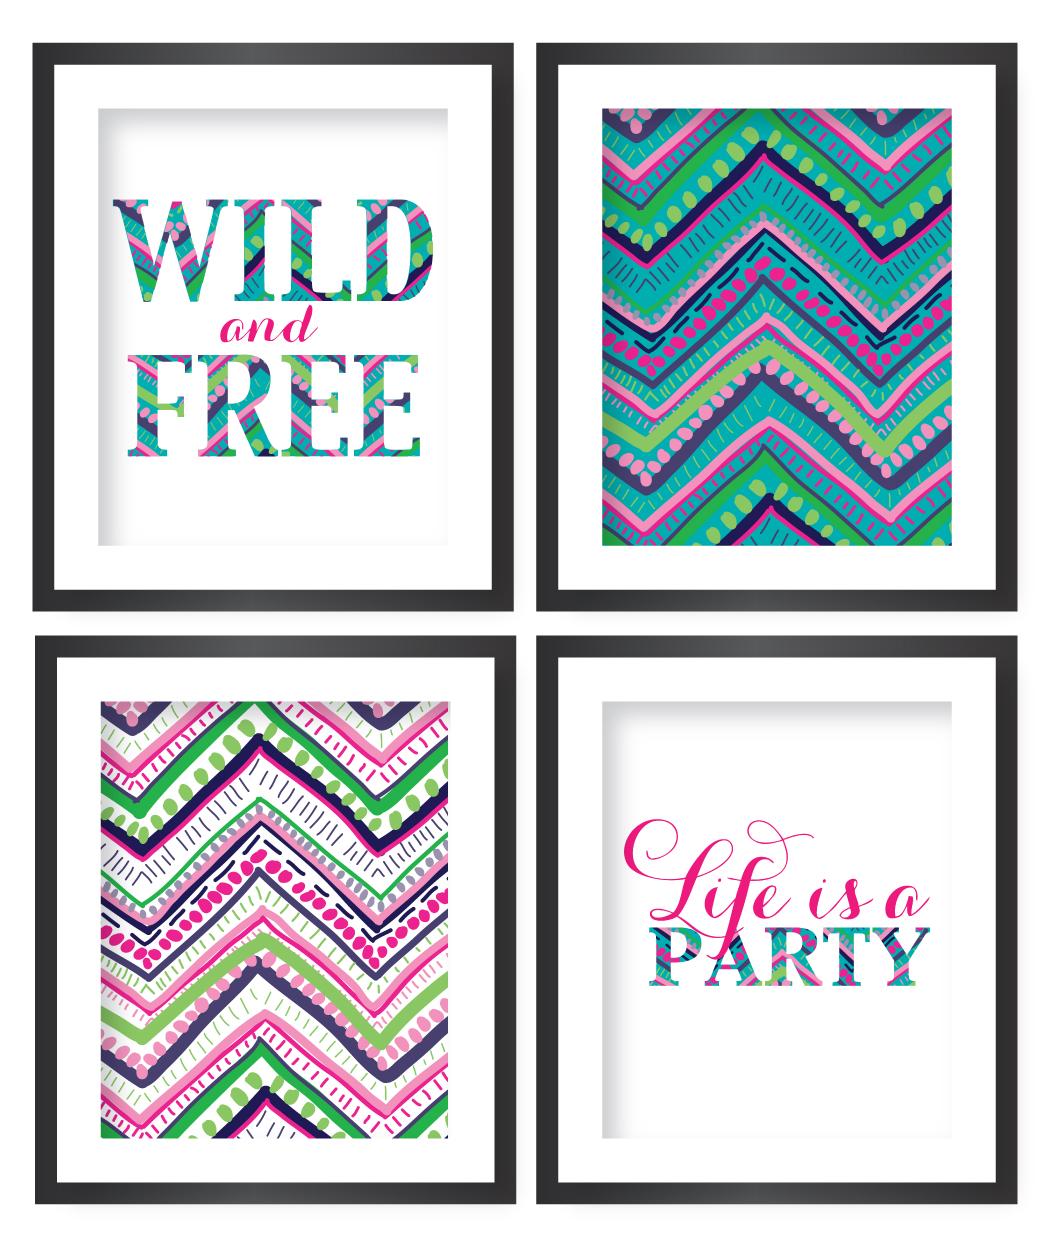 1050x1247px free printable wallpaper designs - wallpapersafari